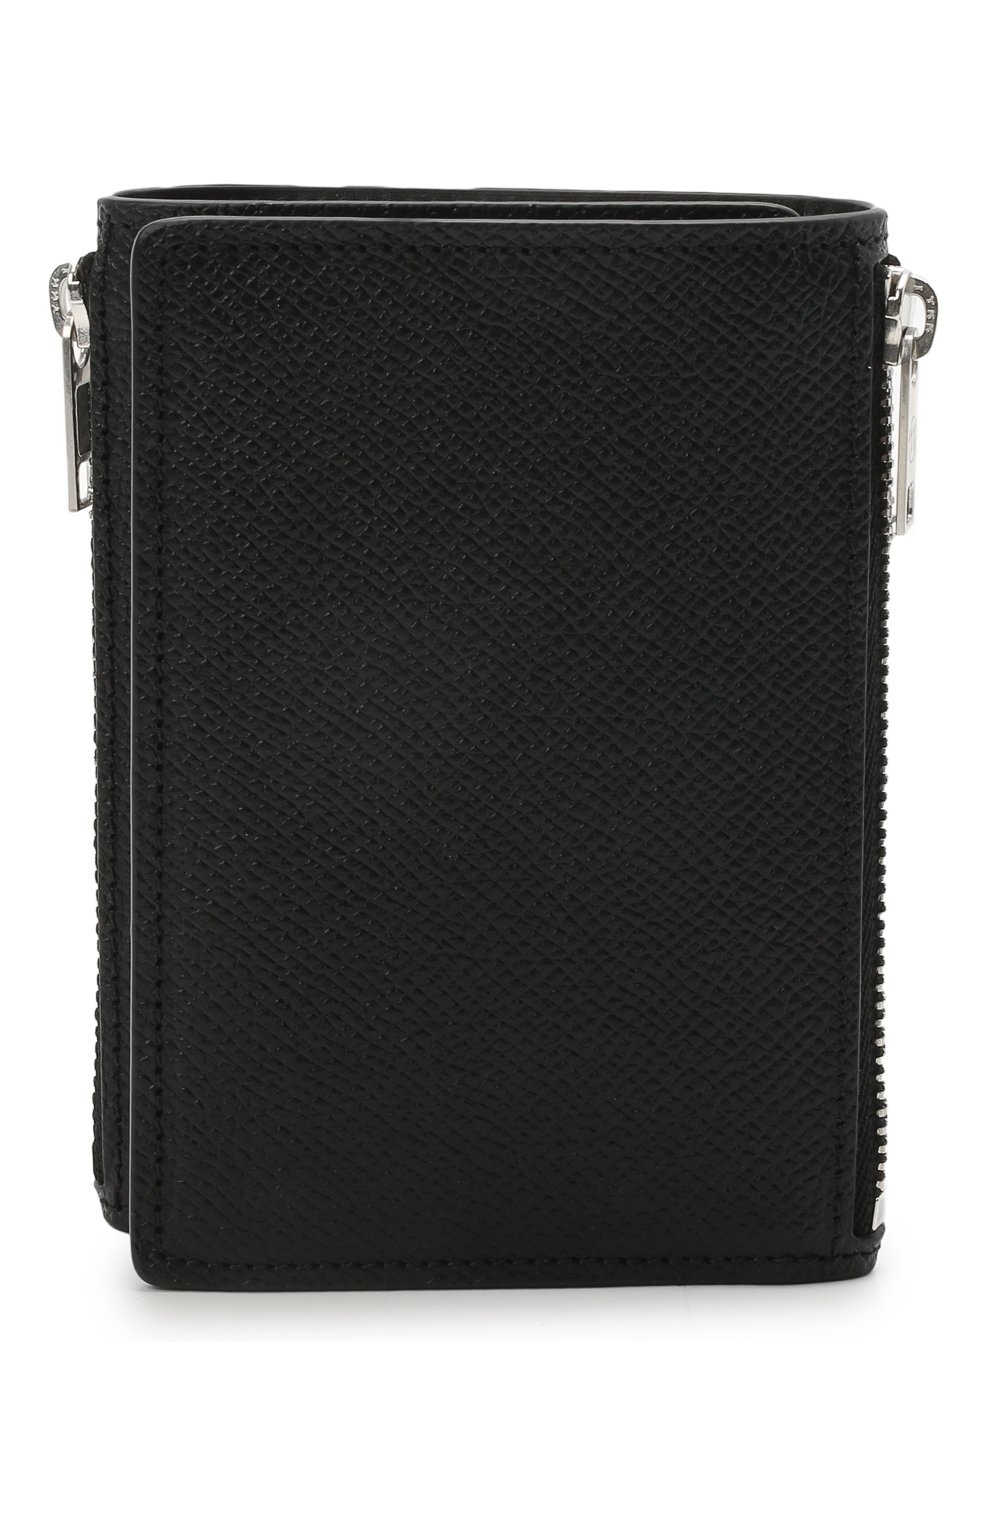 Мужской кожаное портмоне MAISON MARGIELA черного цвета, арт. S55UI0269/P0399   Фото 1 (Материал: Кожа)